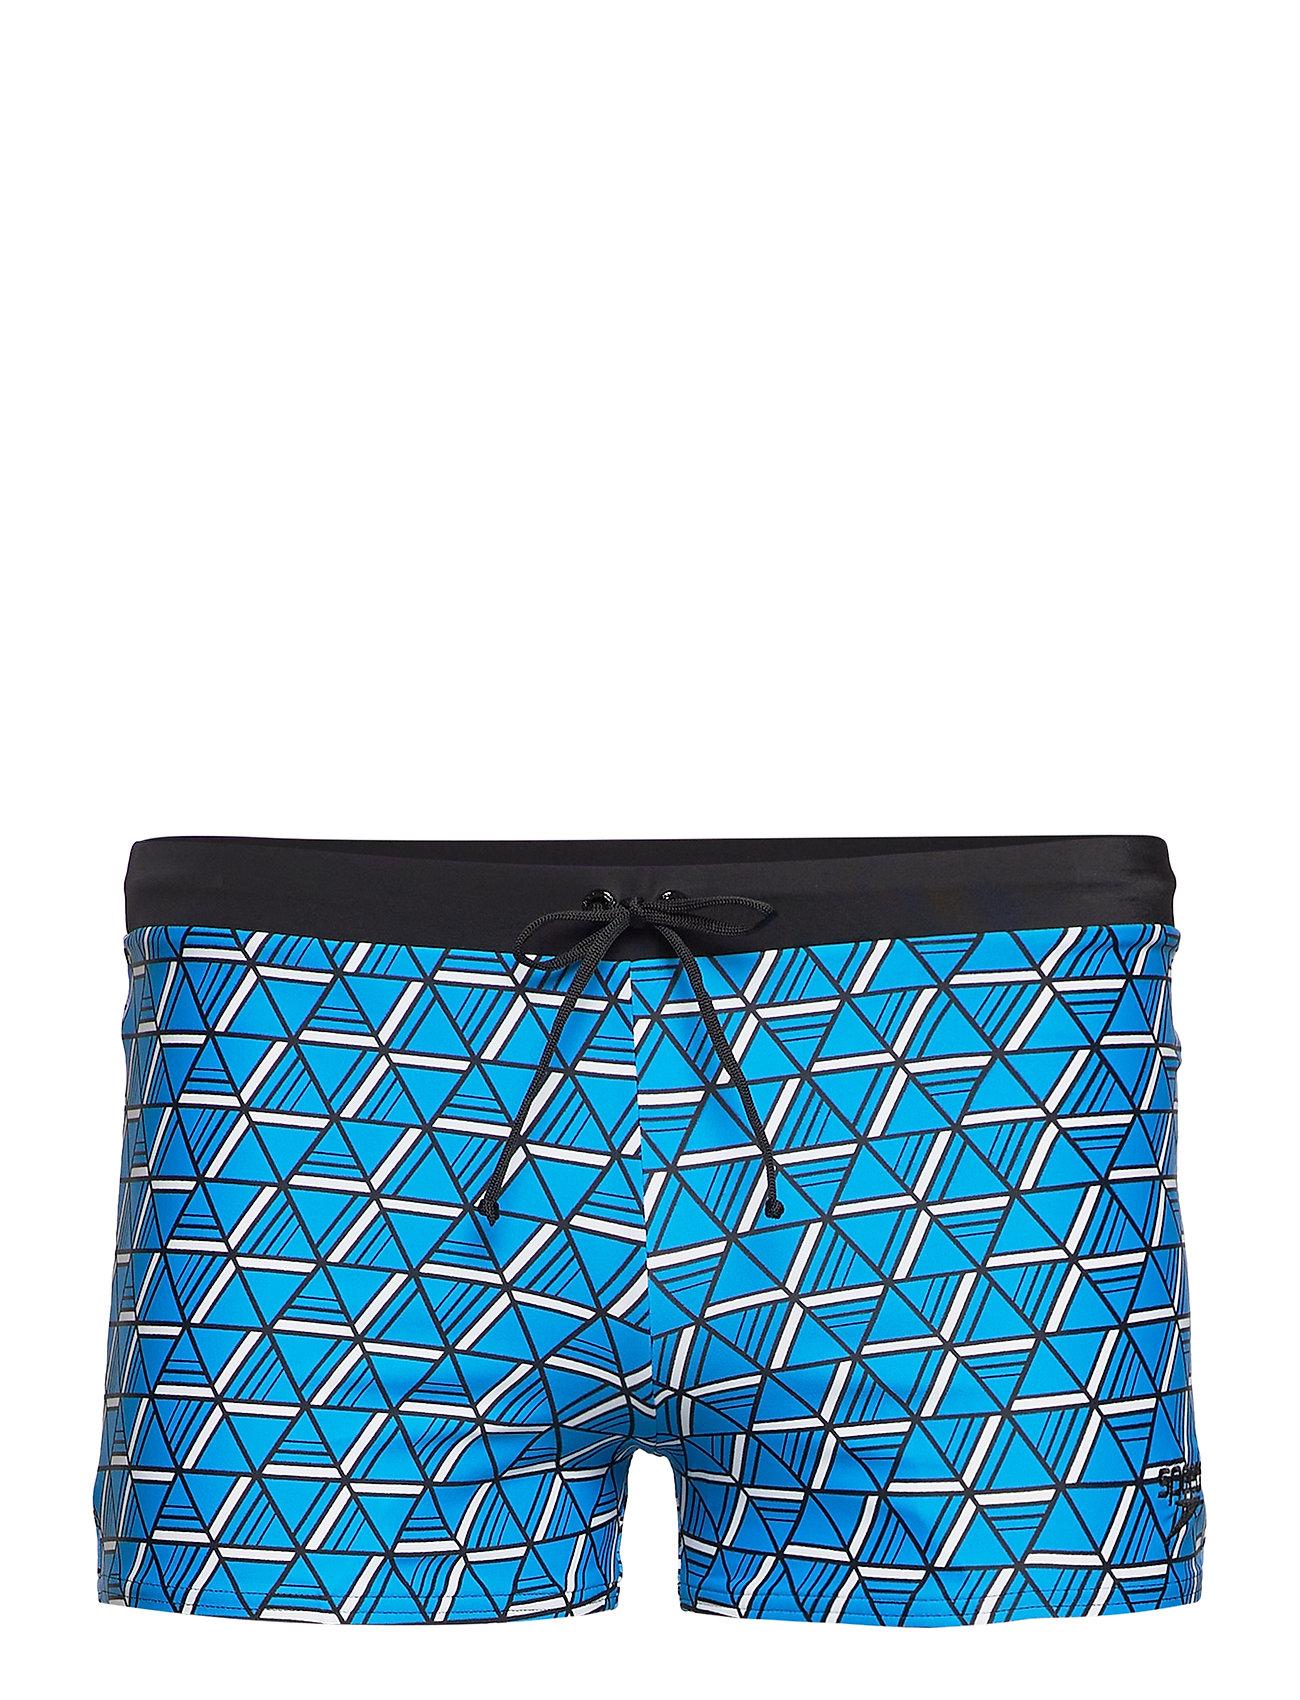 Image of Valmilton Asht Am Swimwear Briefs & Speedos Blå Speedo (3459523449)